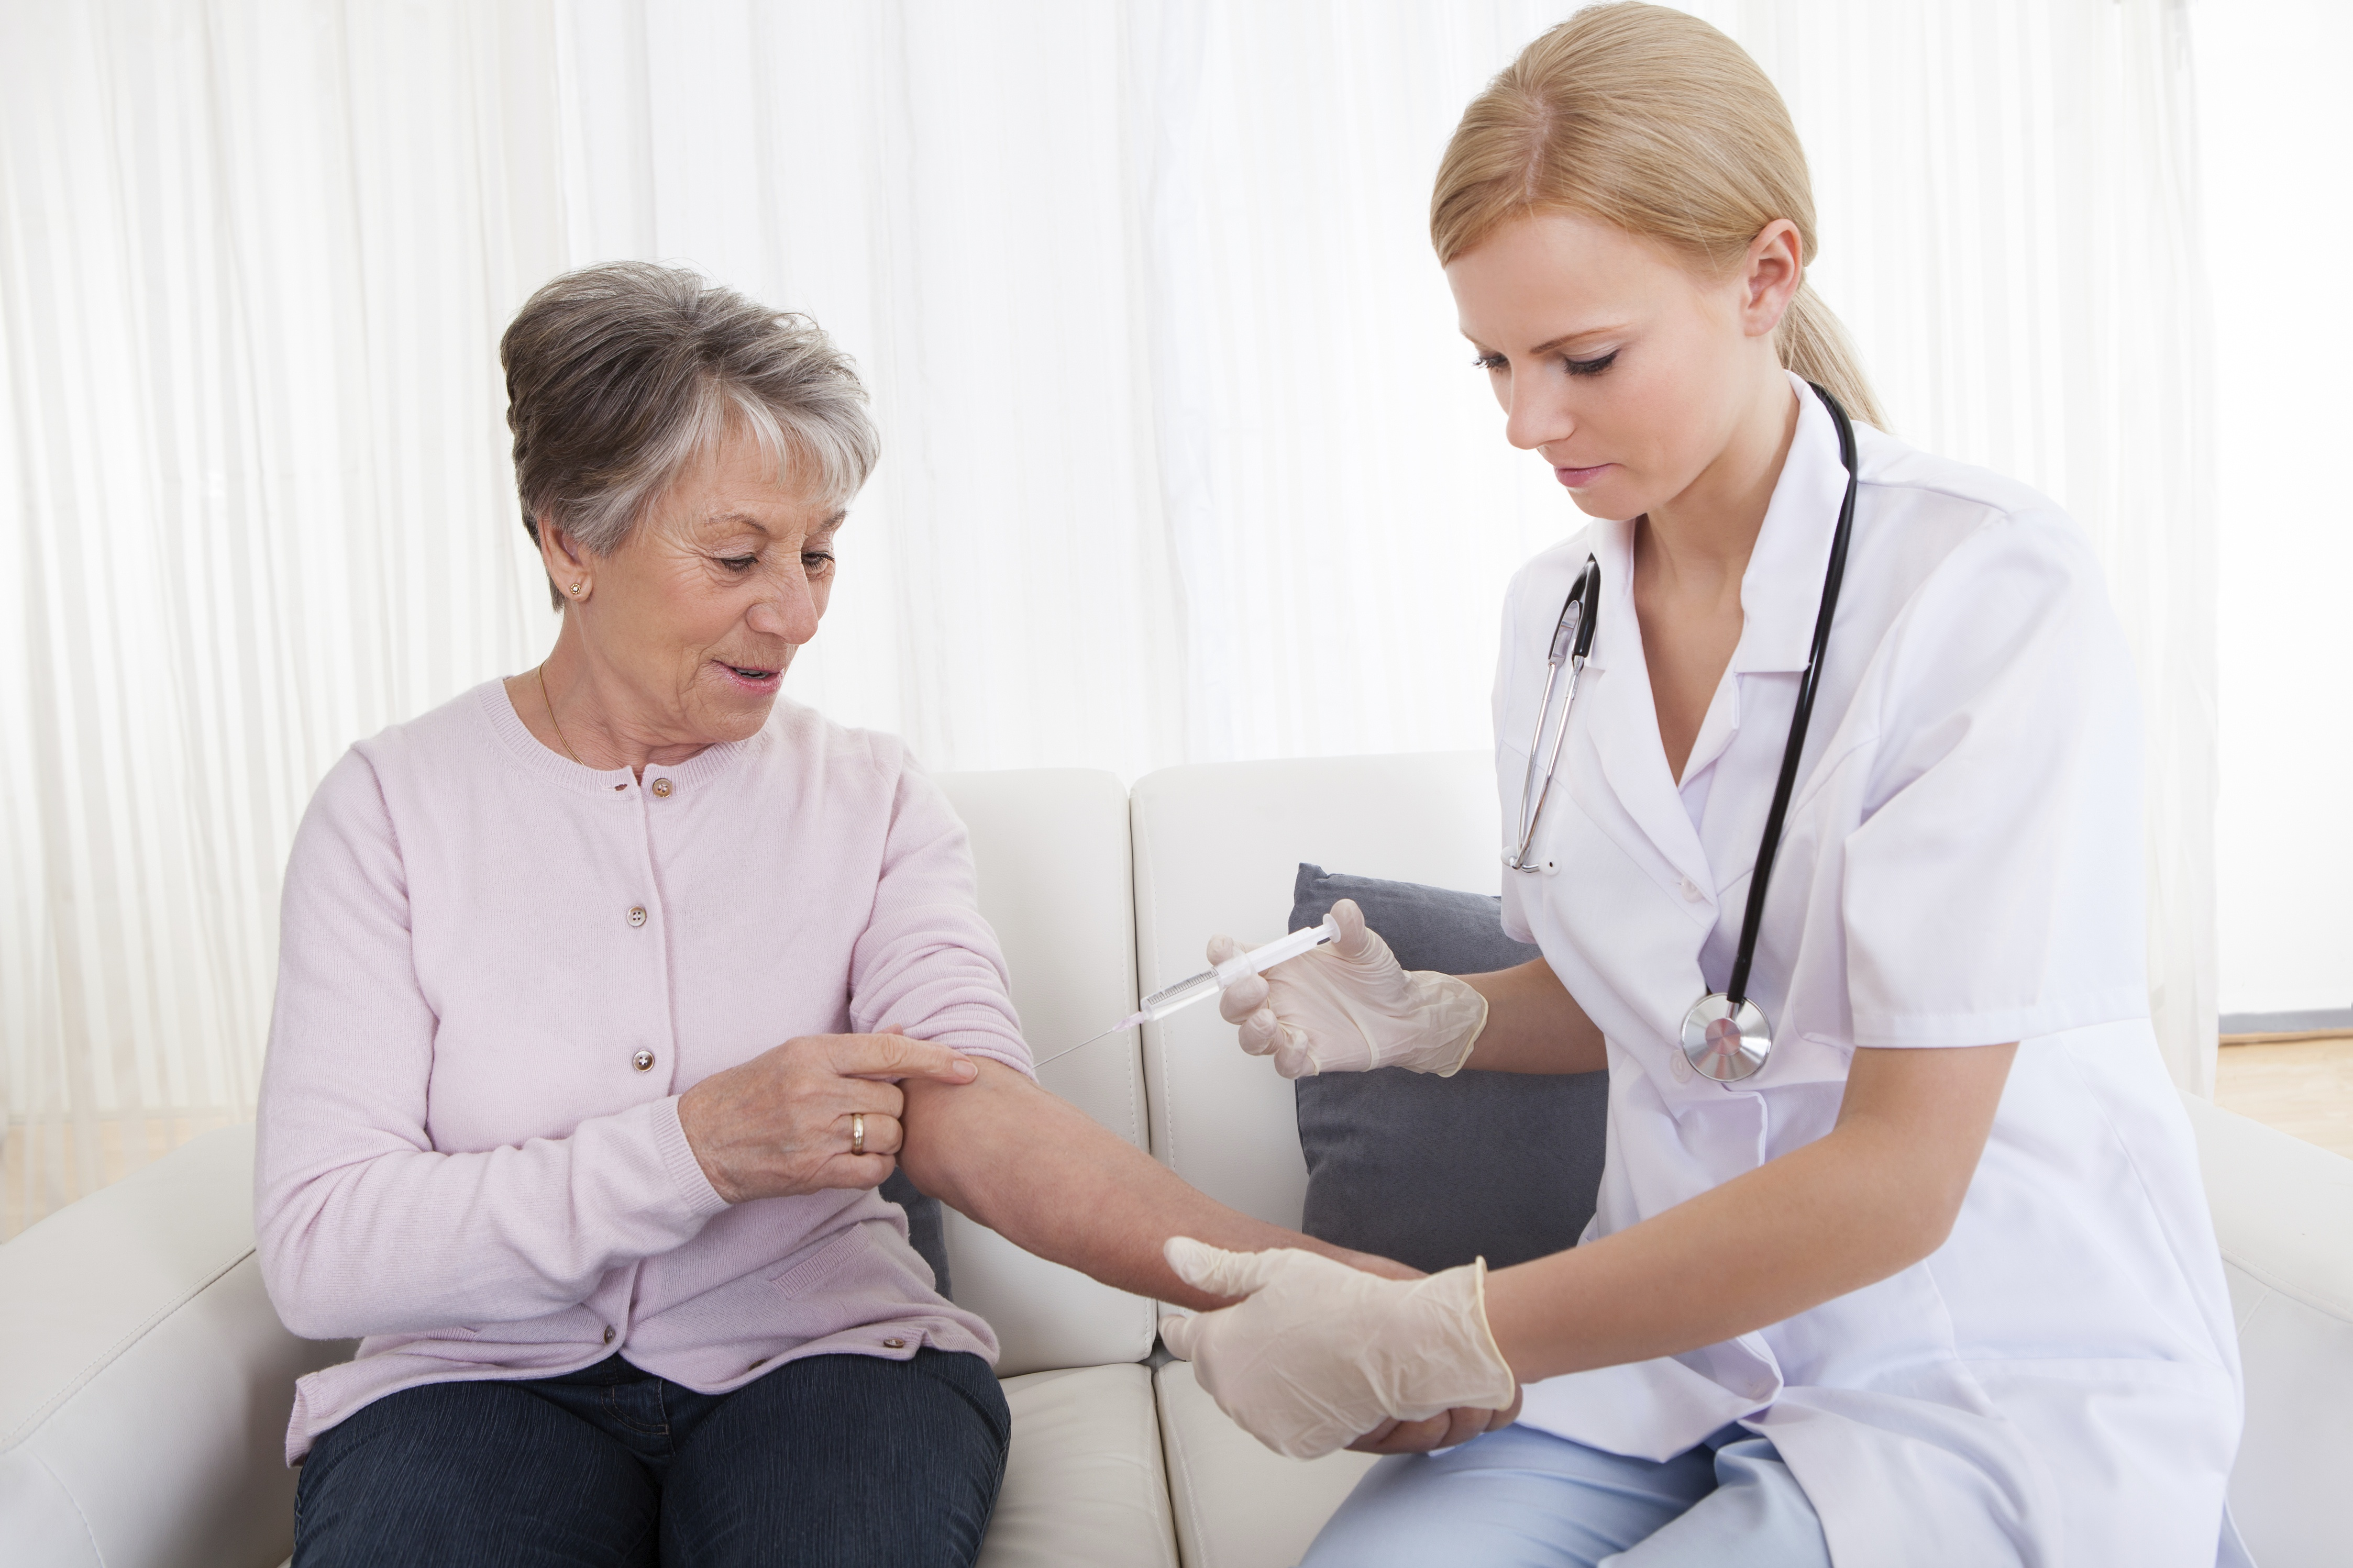 nurse-patient-vaccine.jpg